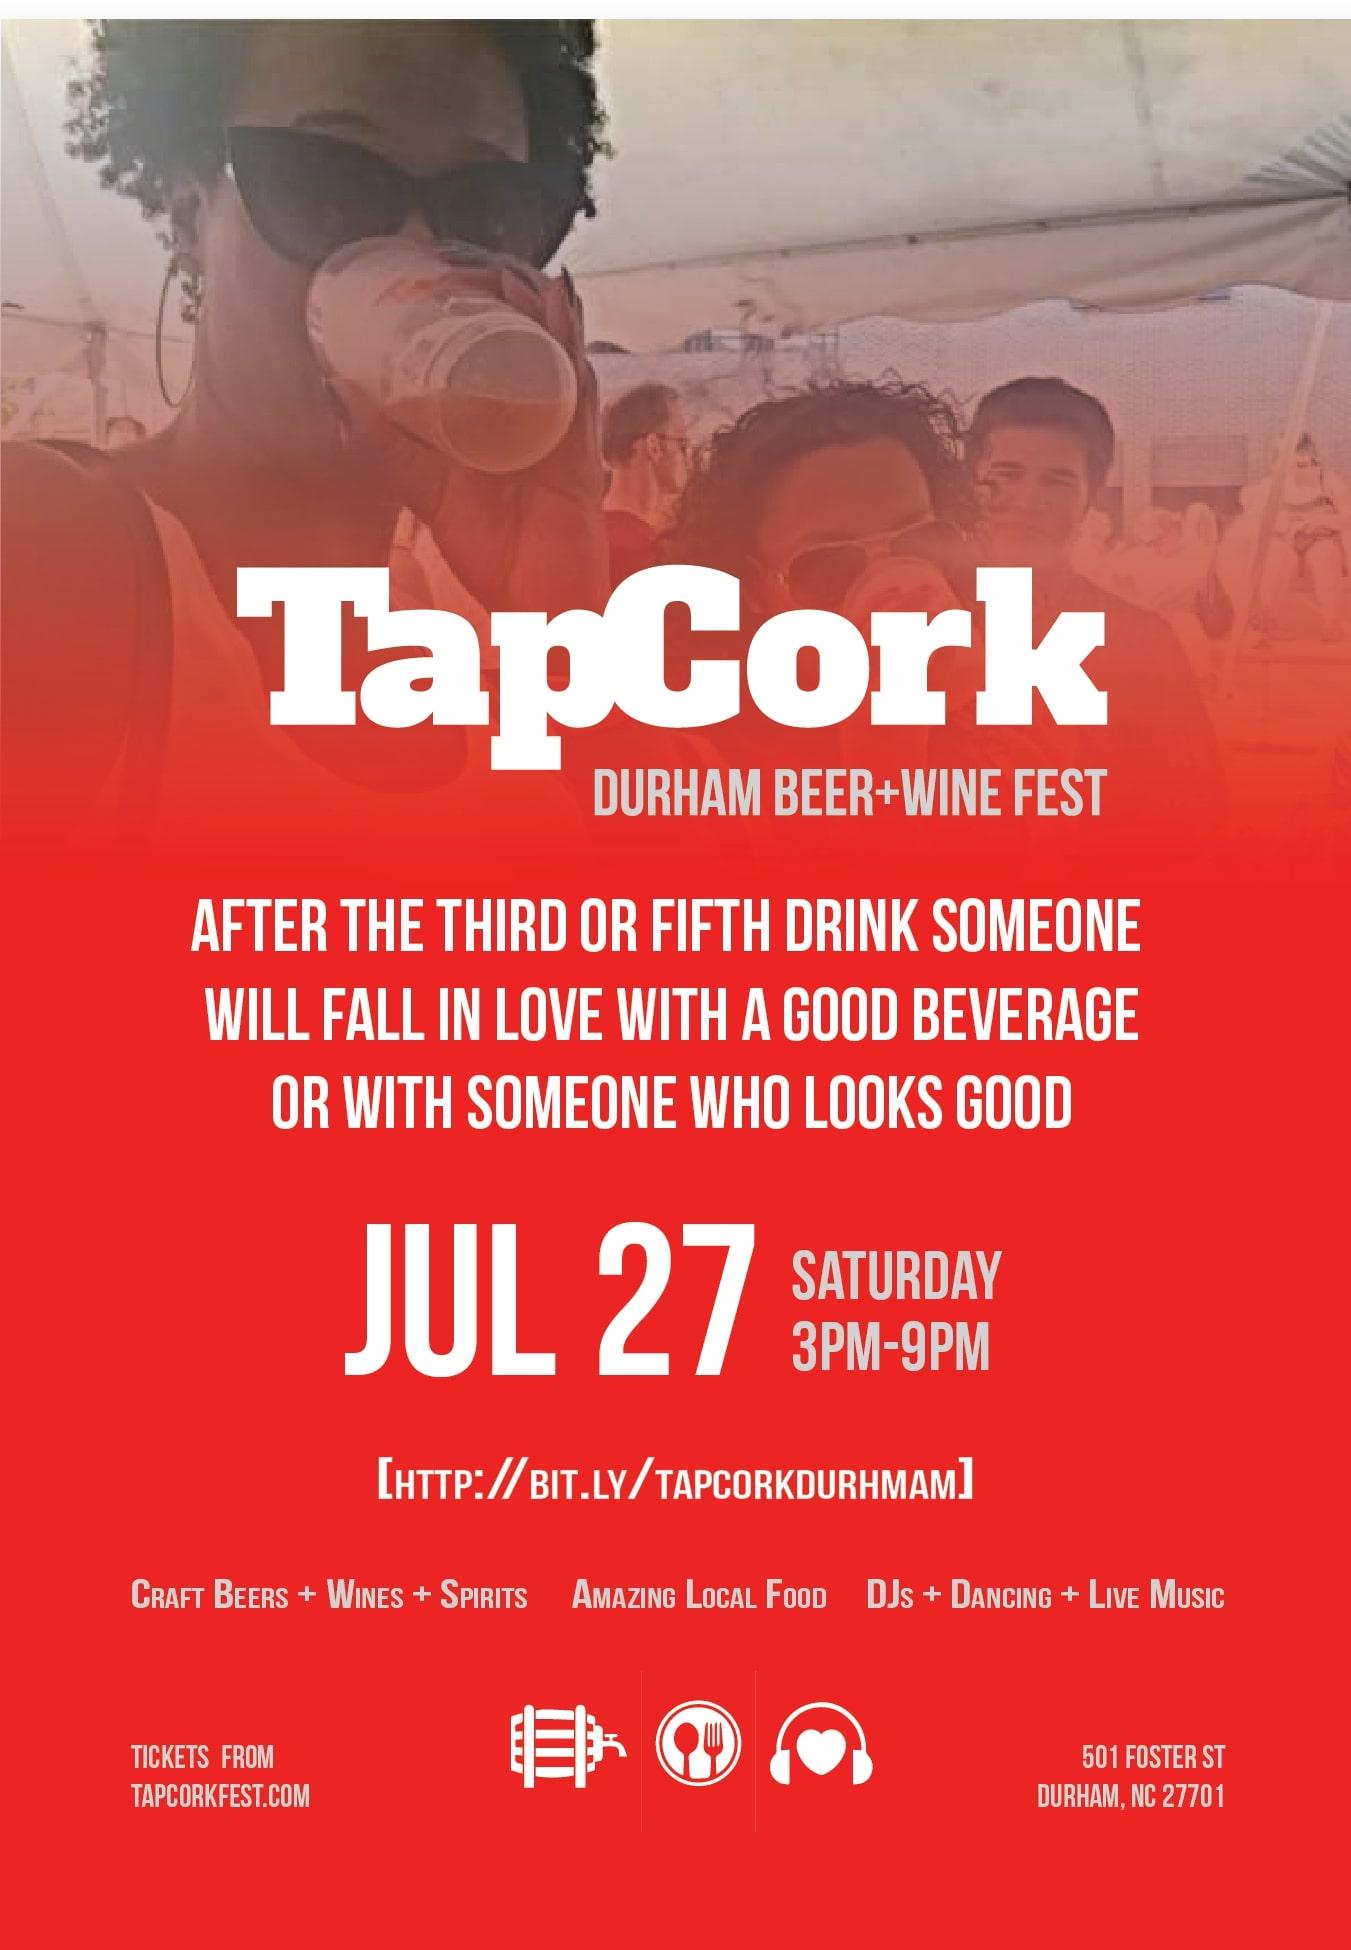 TapCork Durham Beer-Wine Fest.jpg